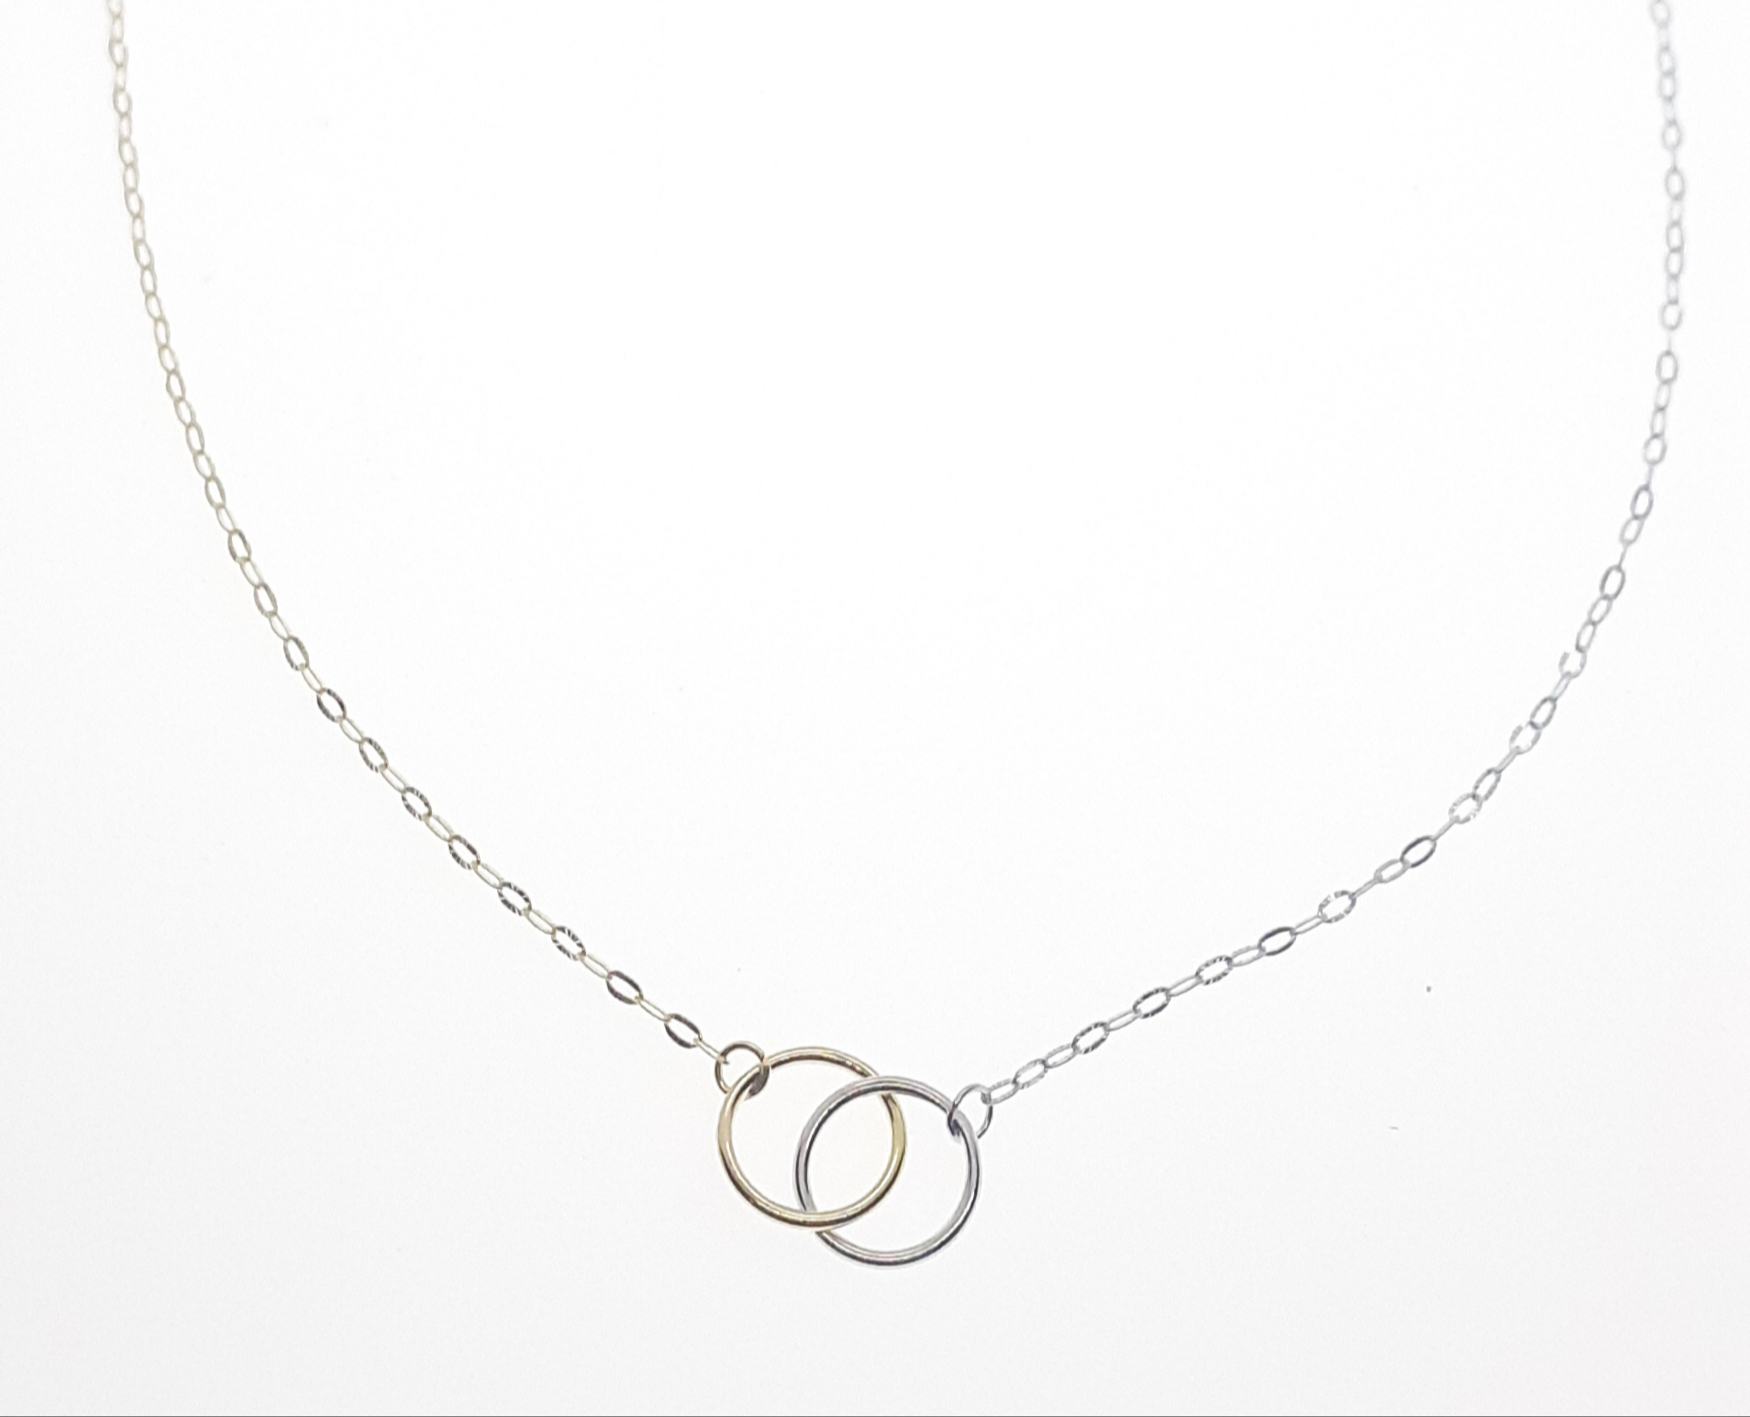 Sensi joyas jewellery Granada silver engagement 18K GOLD PENDANT